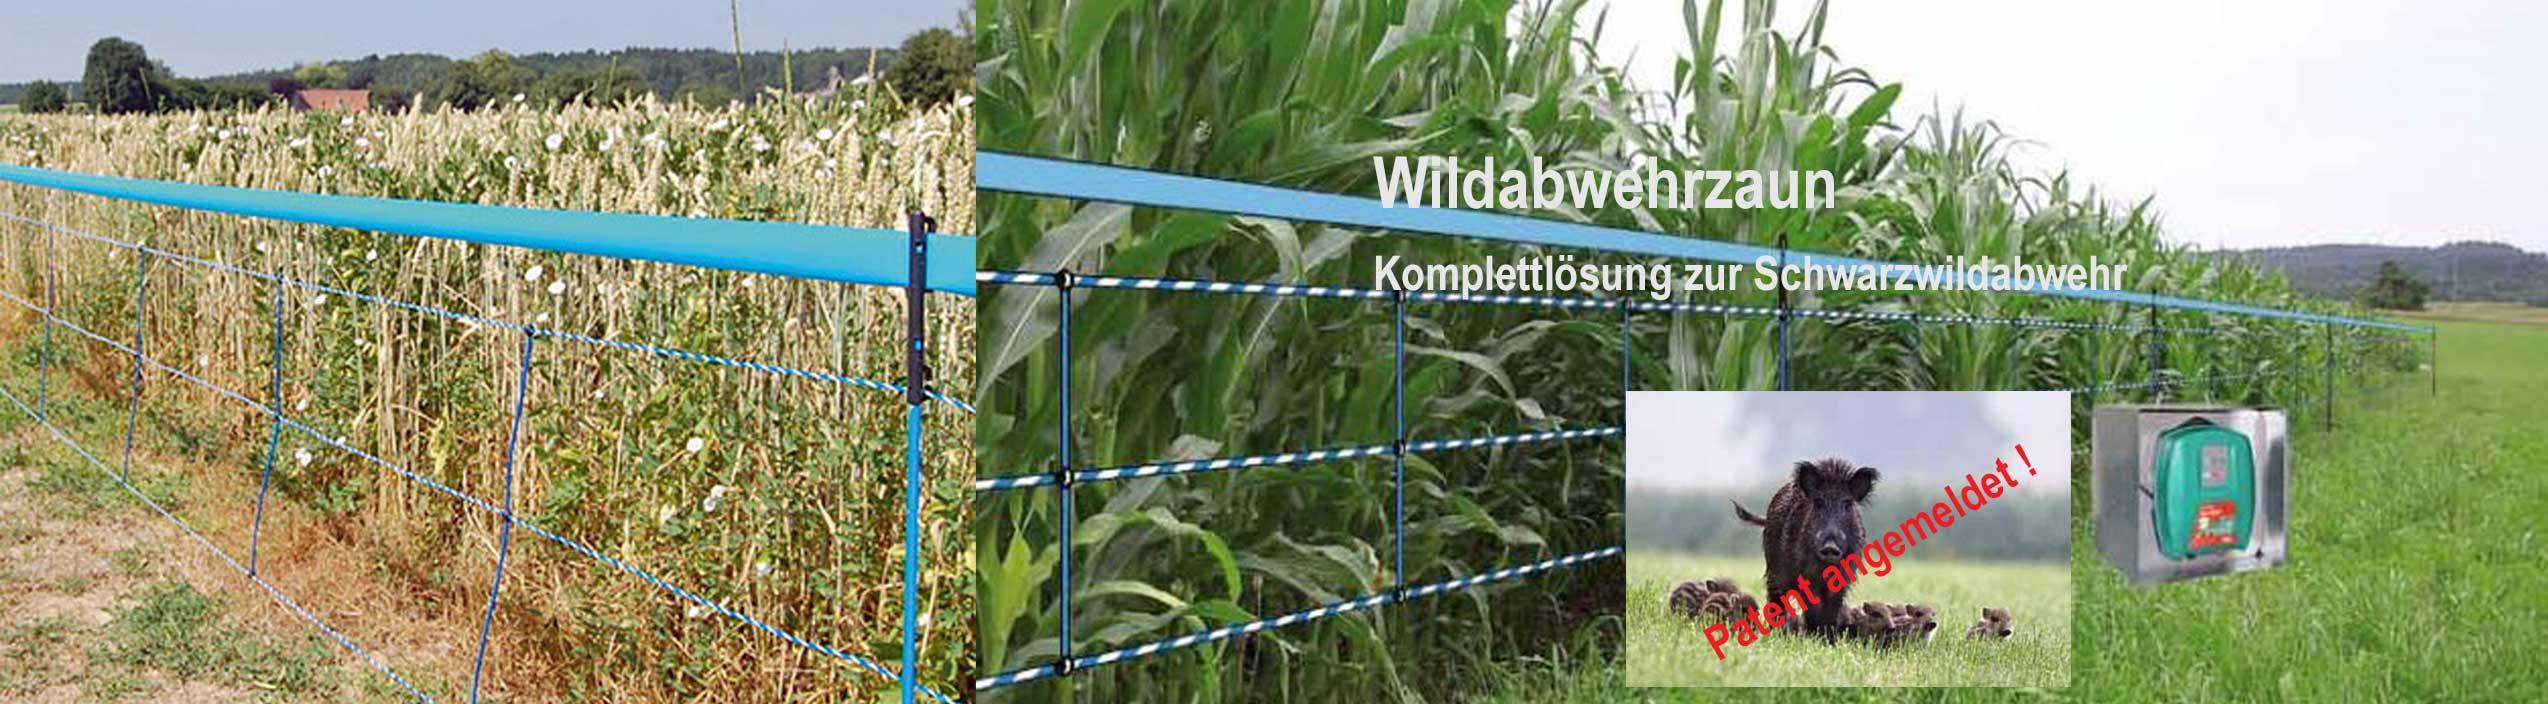 Wildabwehrzaun